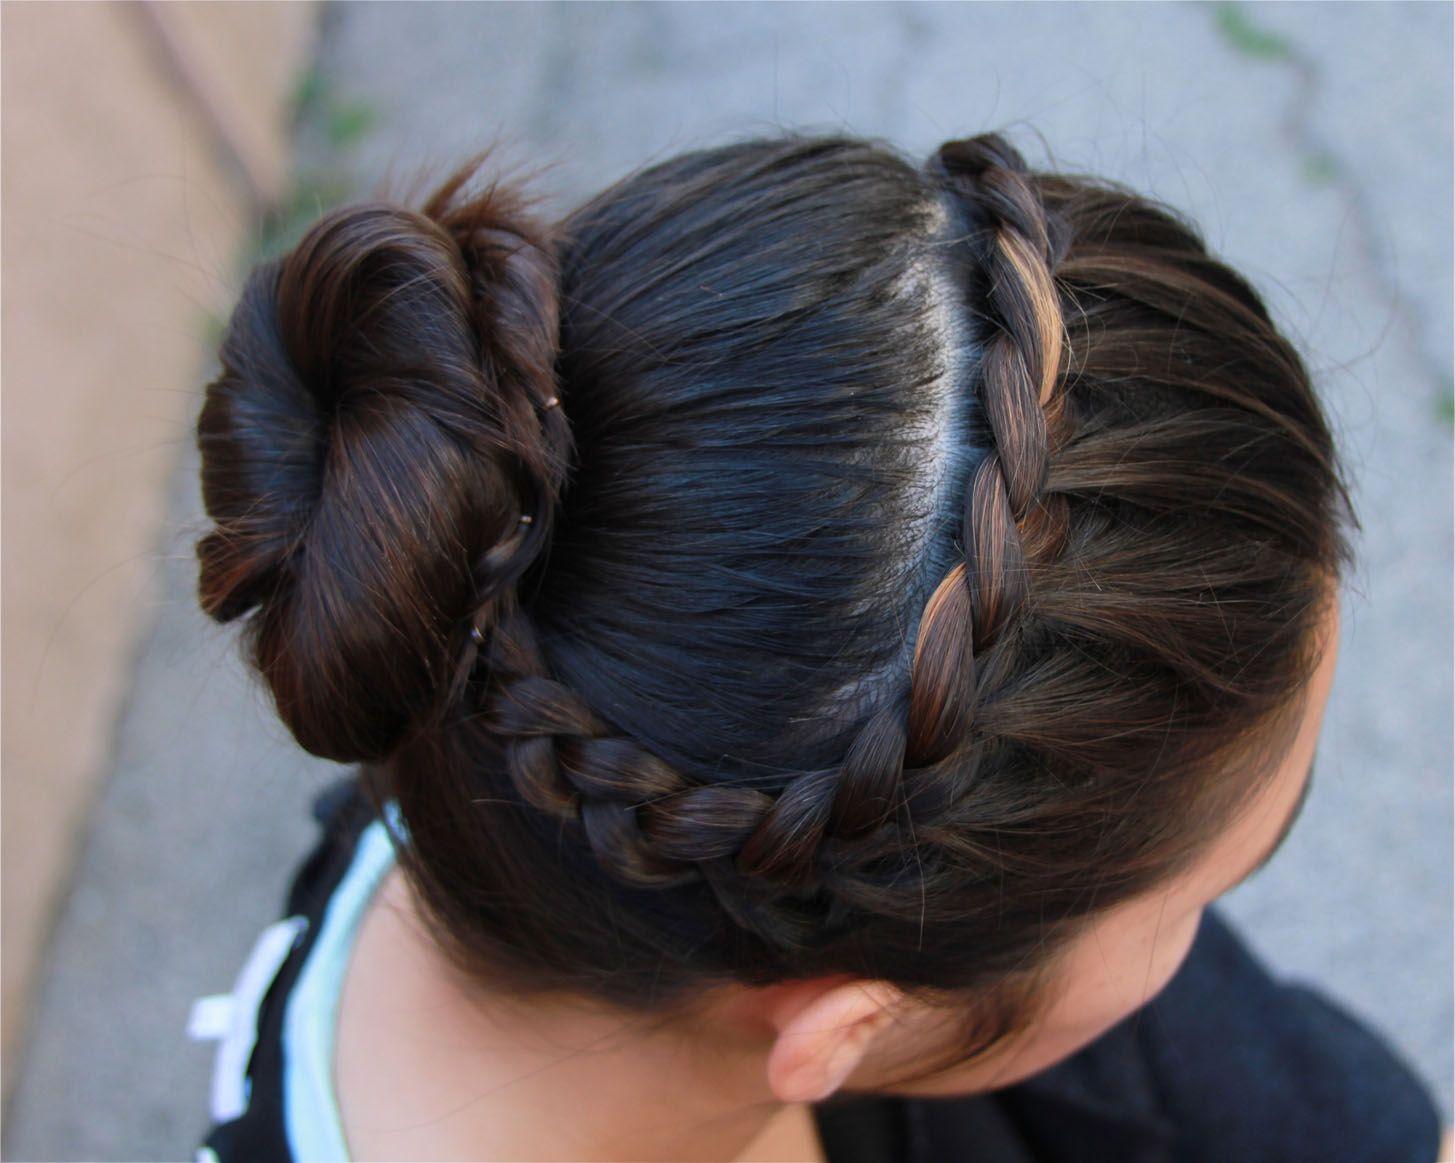 Astonishing French Braid Styles French Braids And Cute Braided Hairstyles On Short Hairstyles Gunalazisus